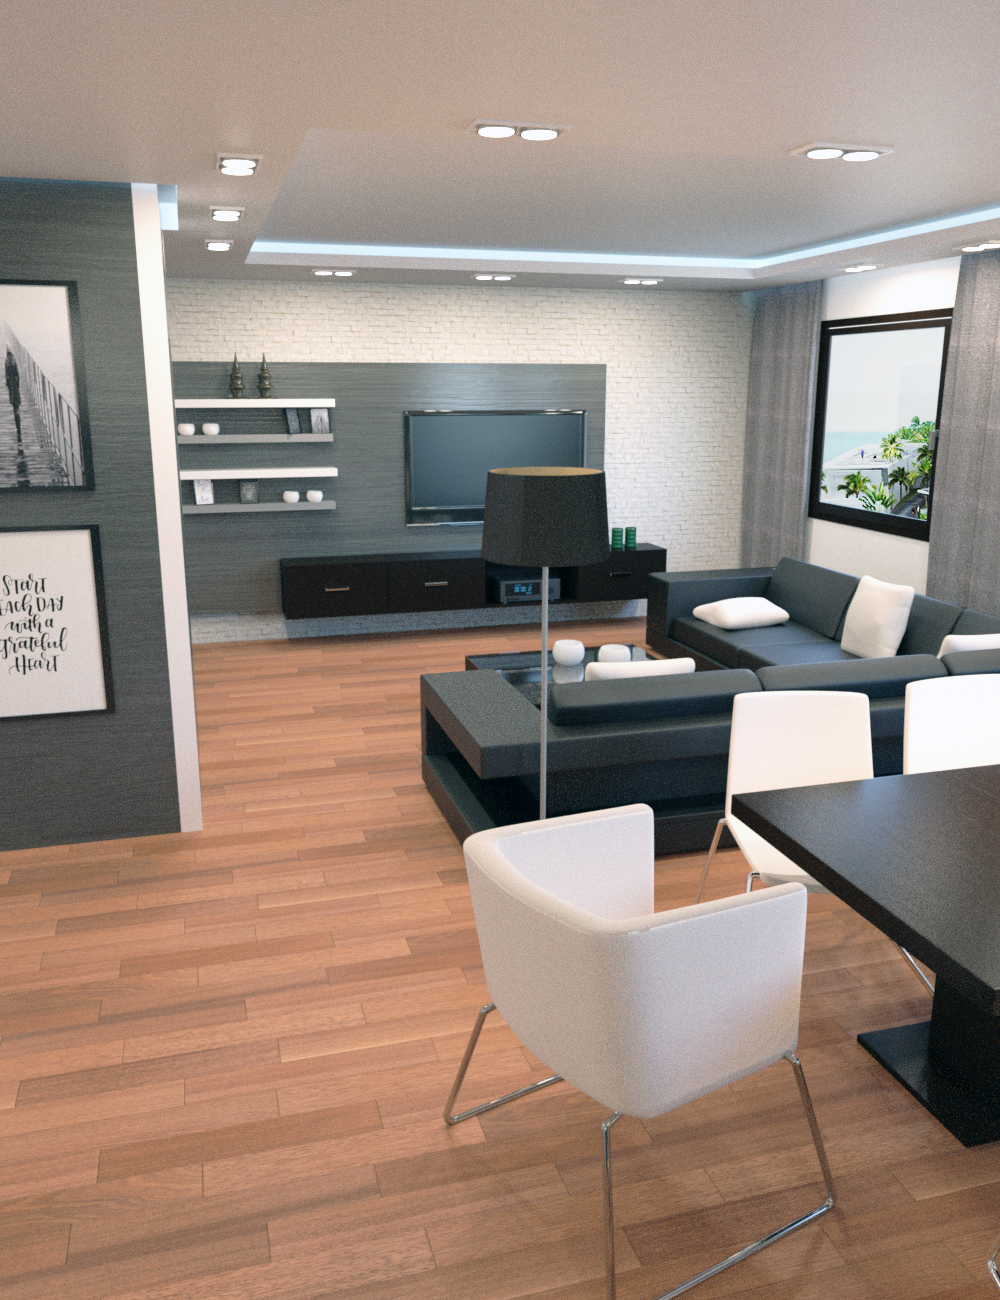 Modish Apartment by: Tesla3dCorp, 3D Models by Daz 3D